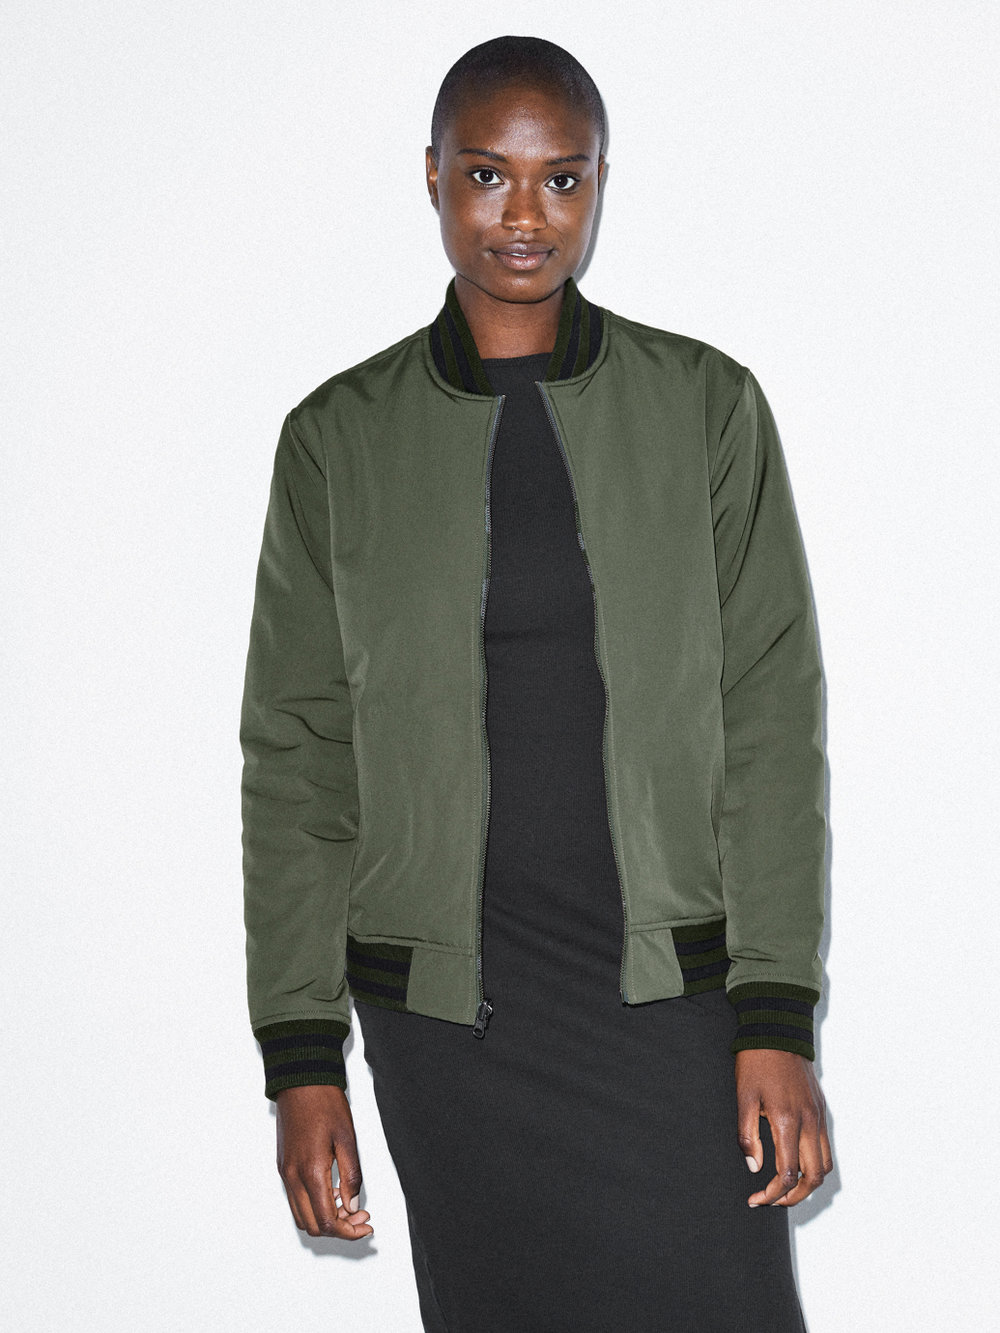 american-apparel-olive-bomber-jacket